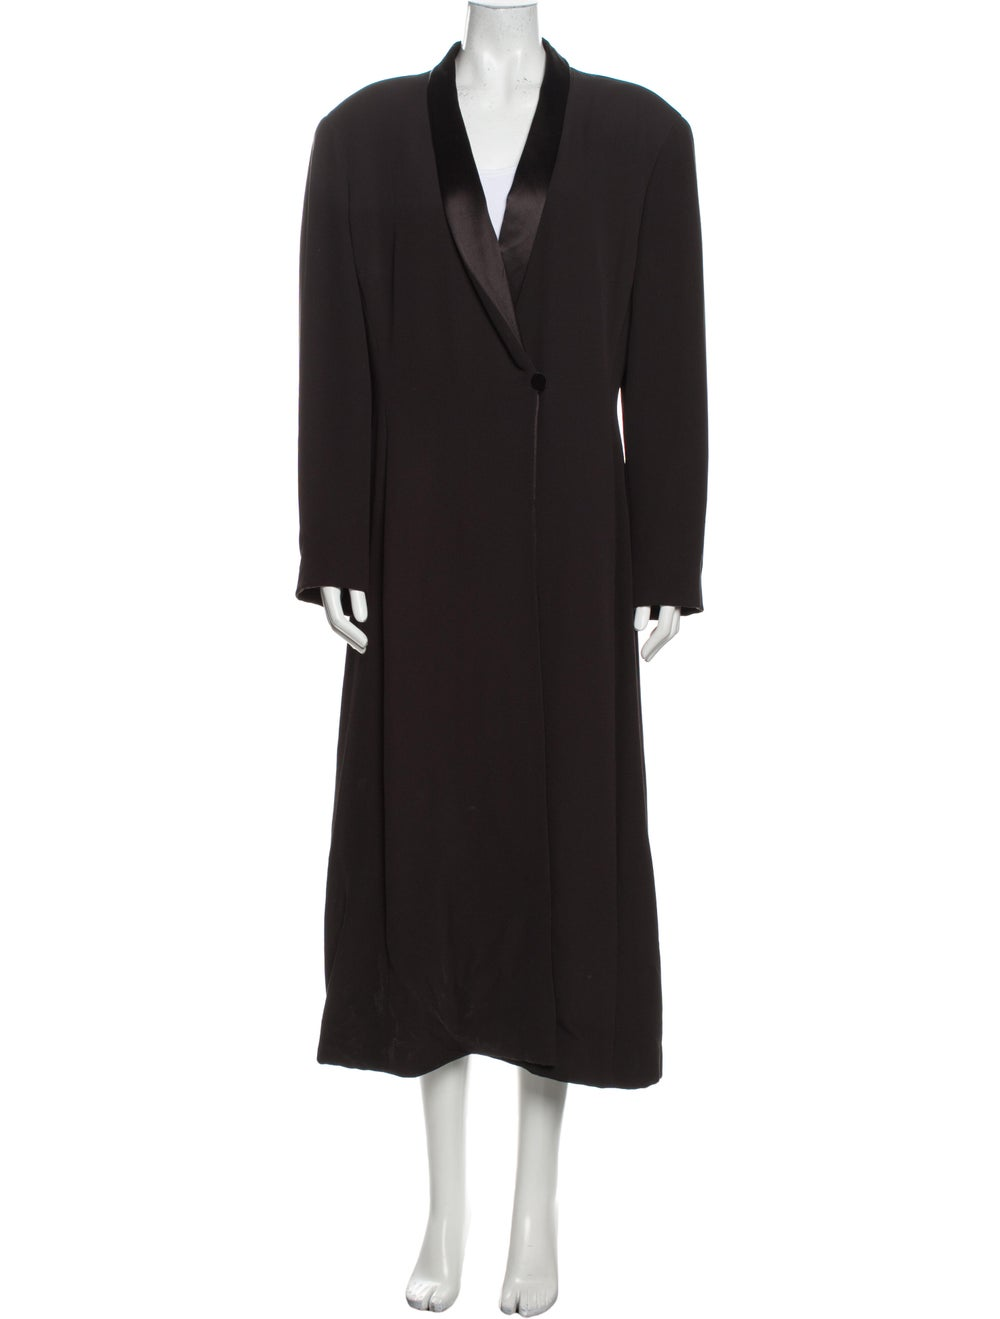 Giorgio Armani Vintage 1990's Coat Grey - image 1